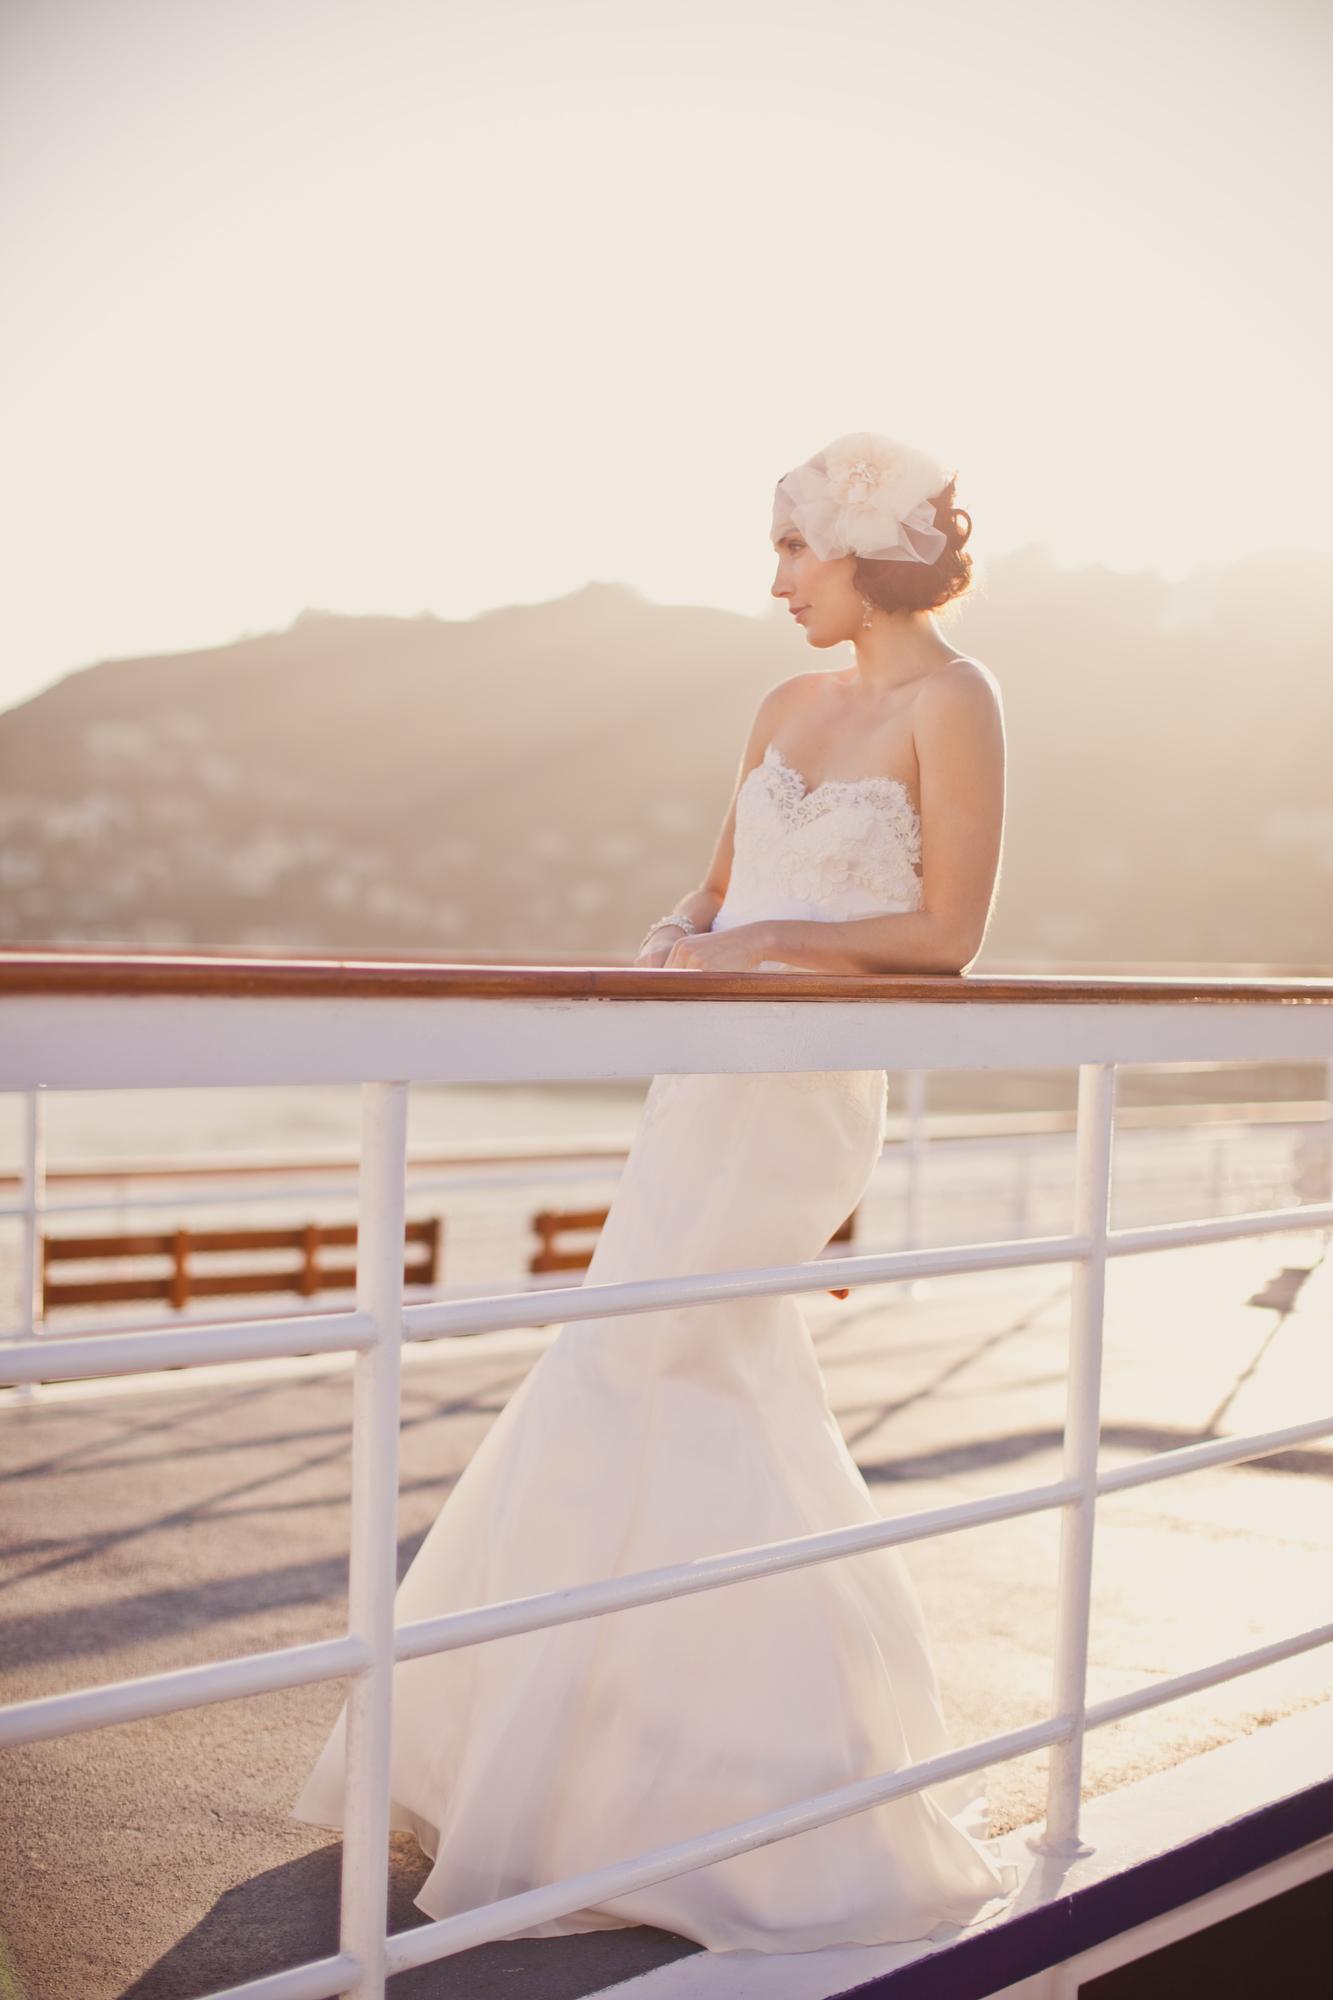 jennifer-skog-bridal-fashion-photographer-lifestyle-0015.jpg